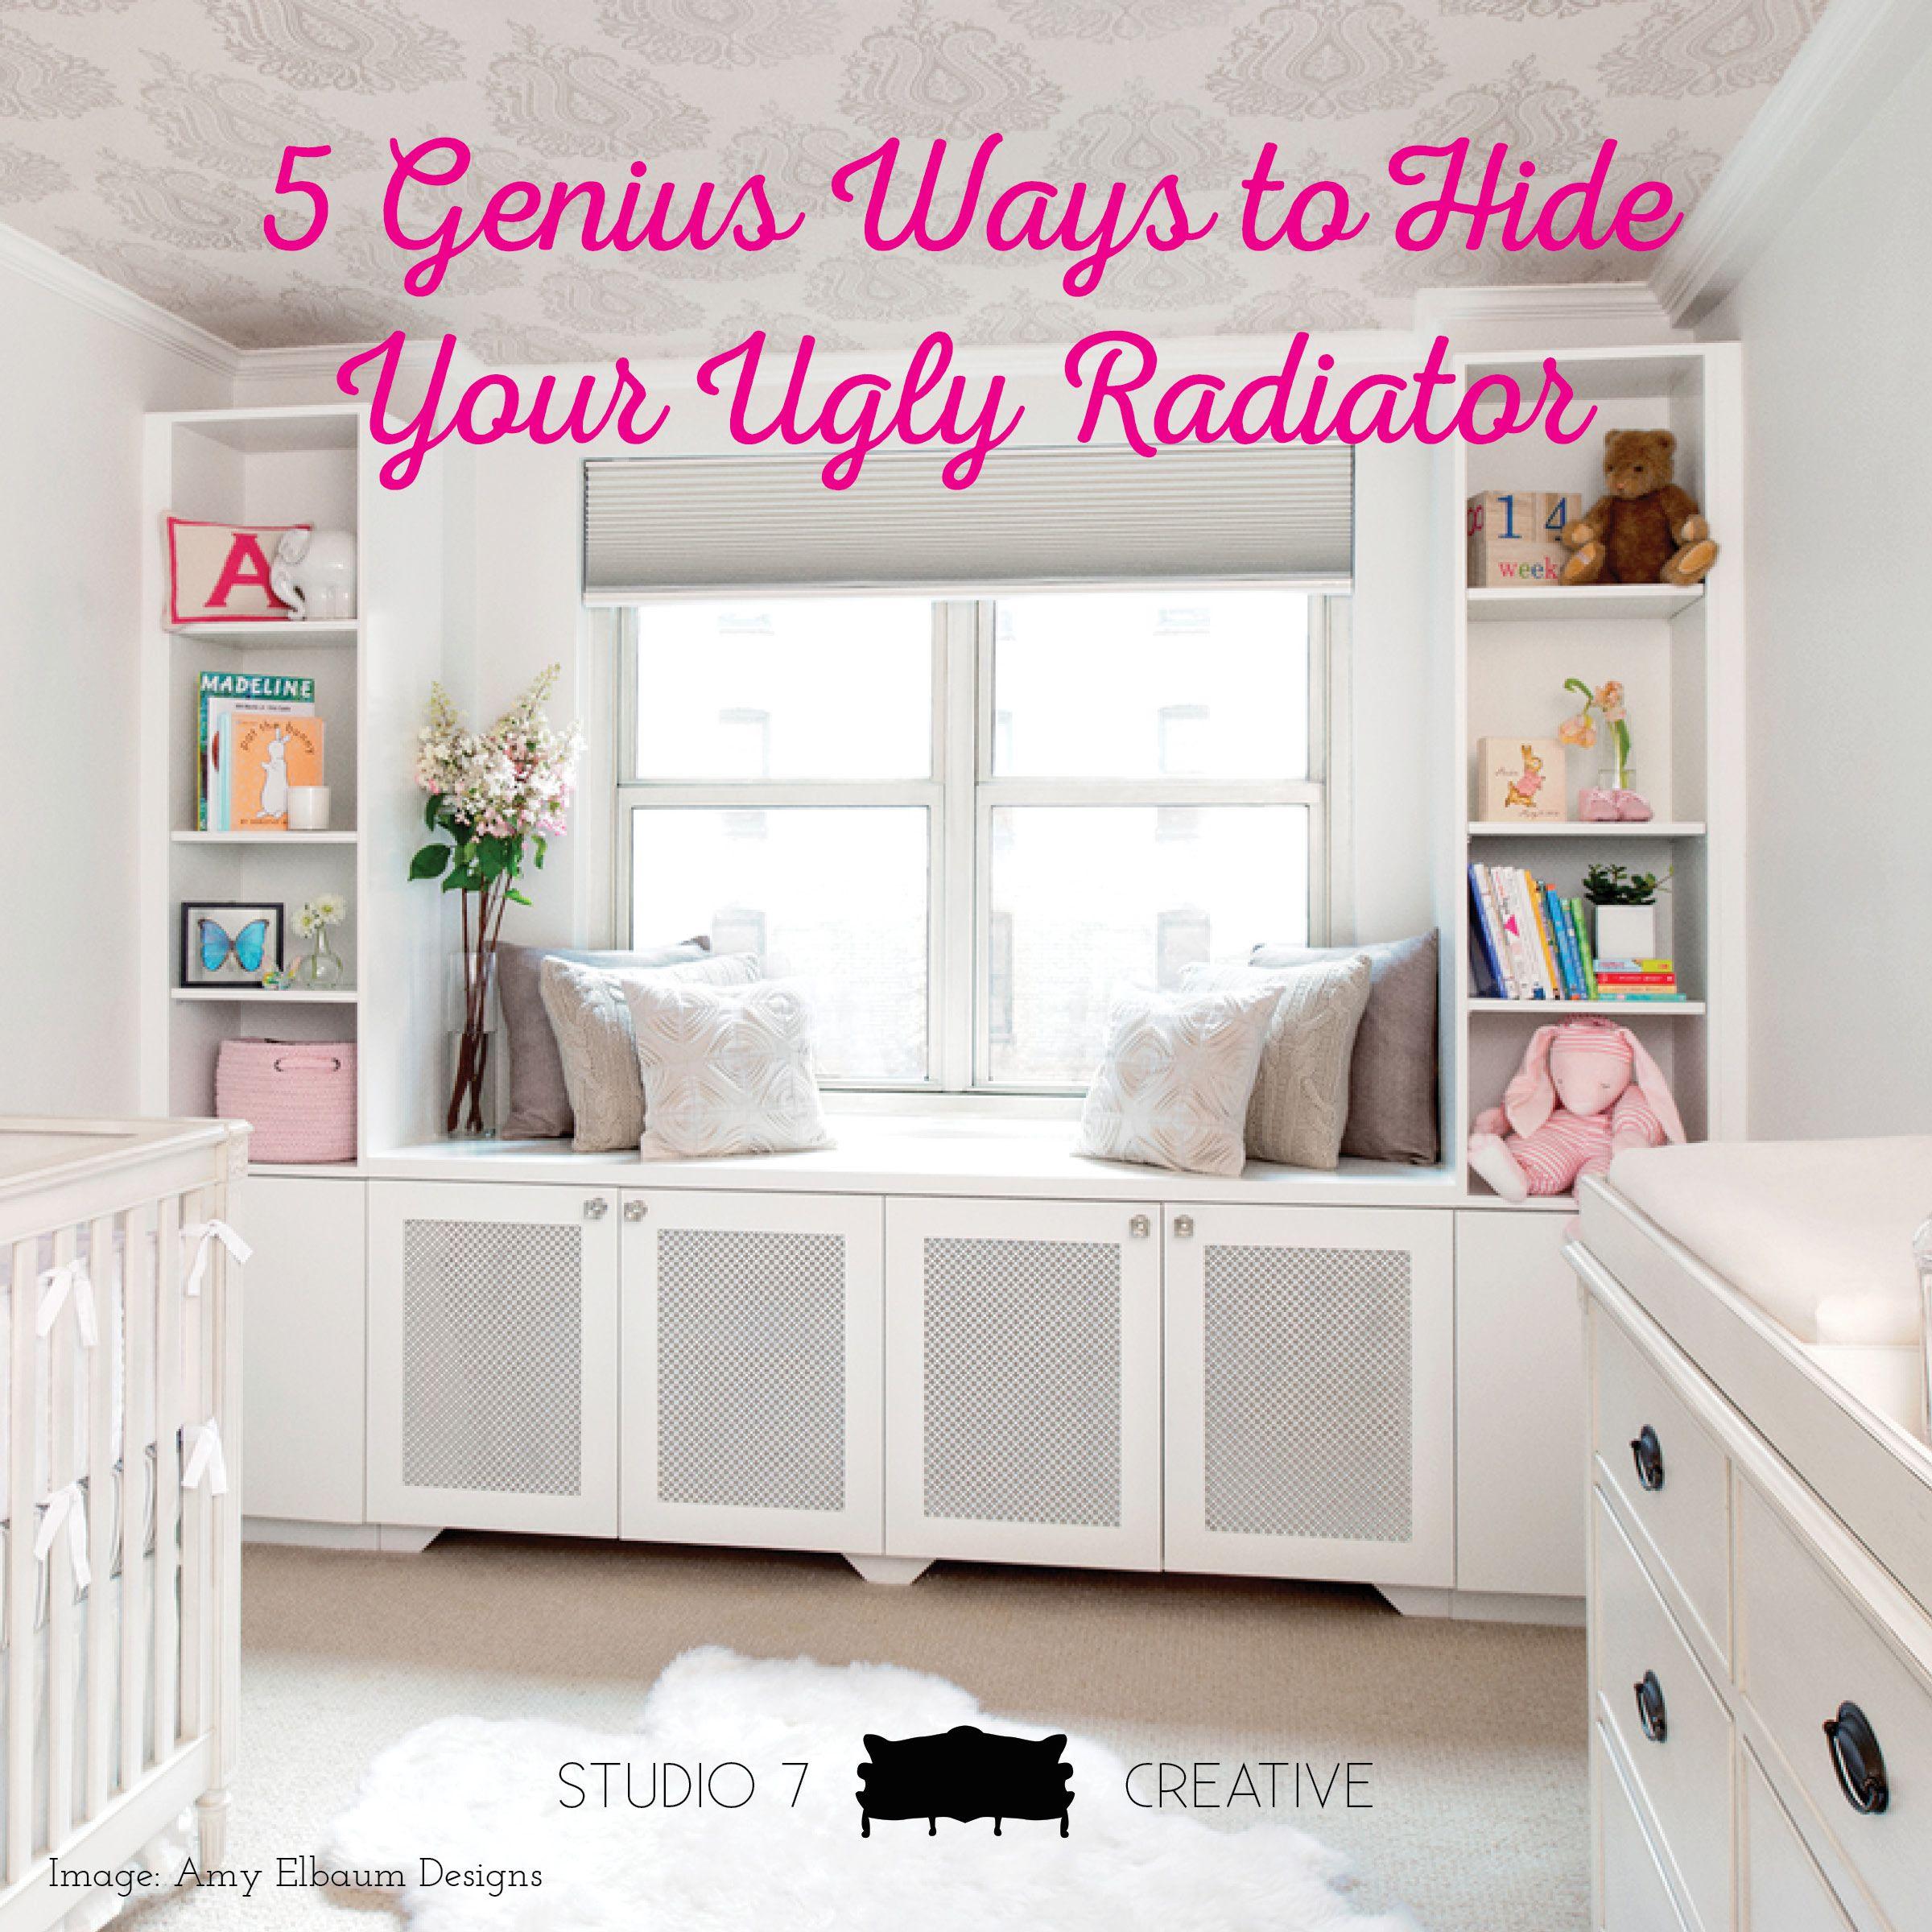 5 Genius Ways to Hide Your Ugly Radiator